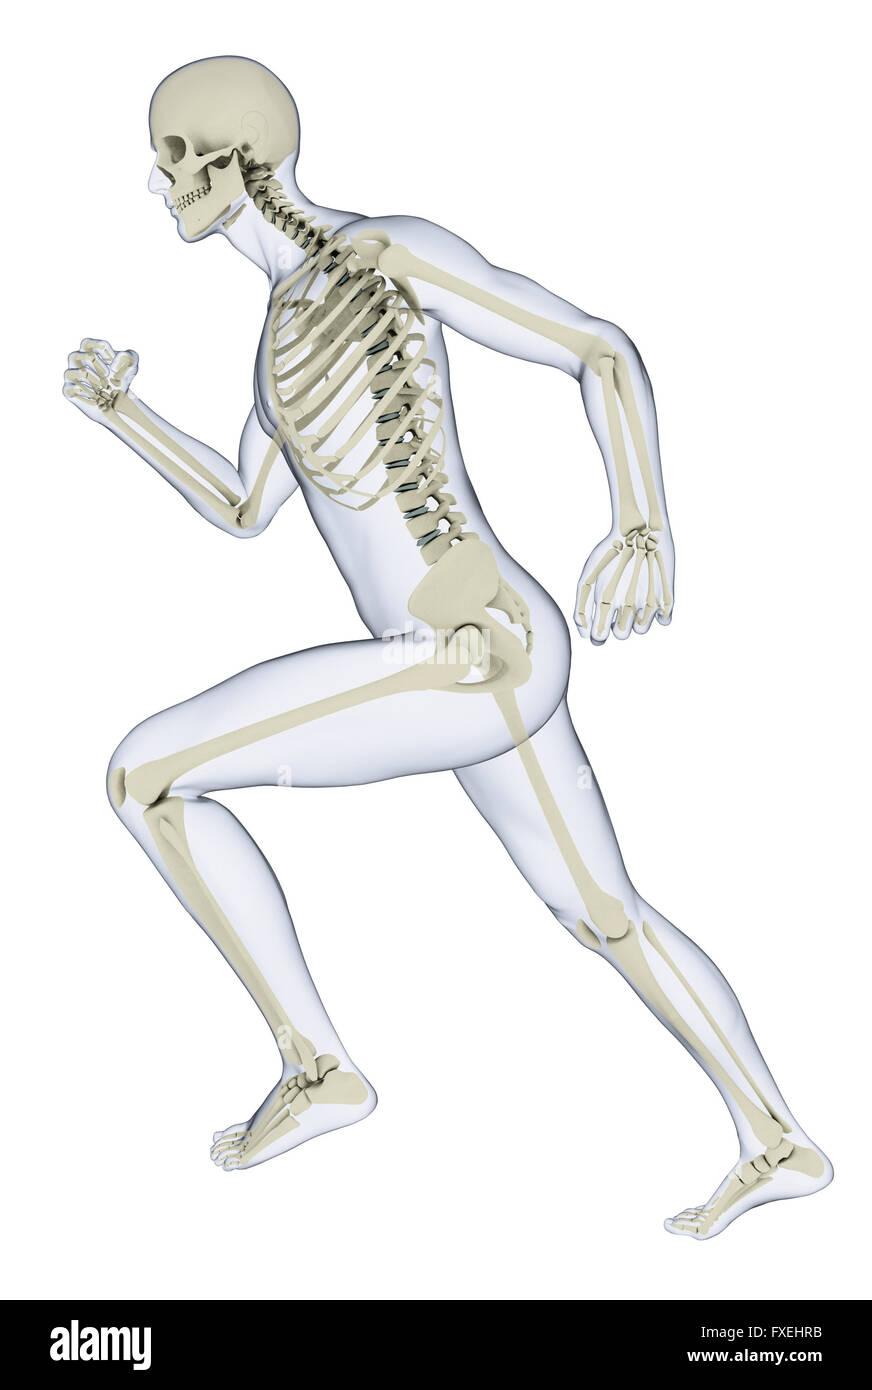 human skeleton in running position stock photos human skeleton in